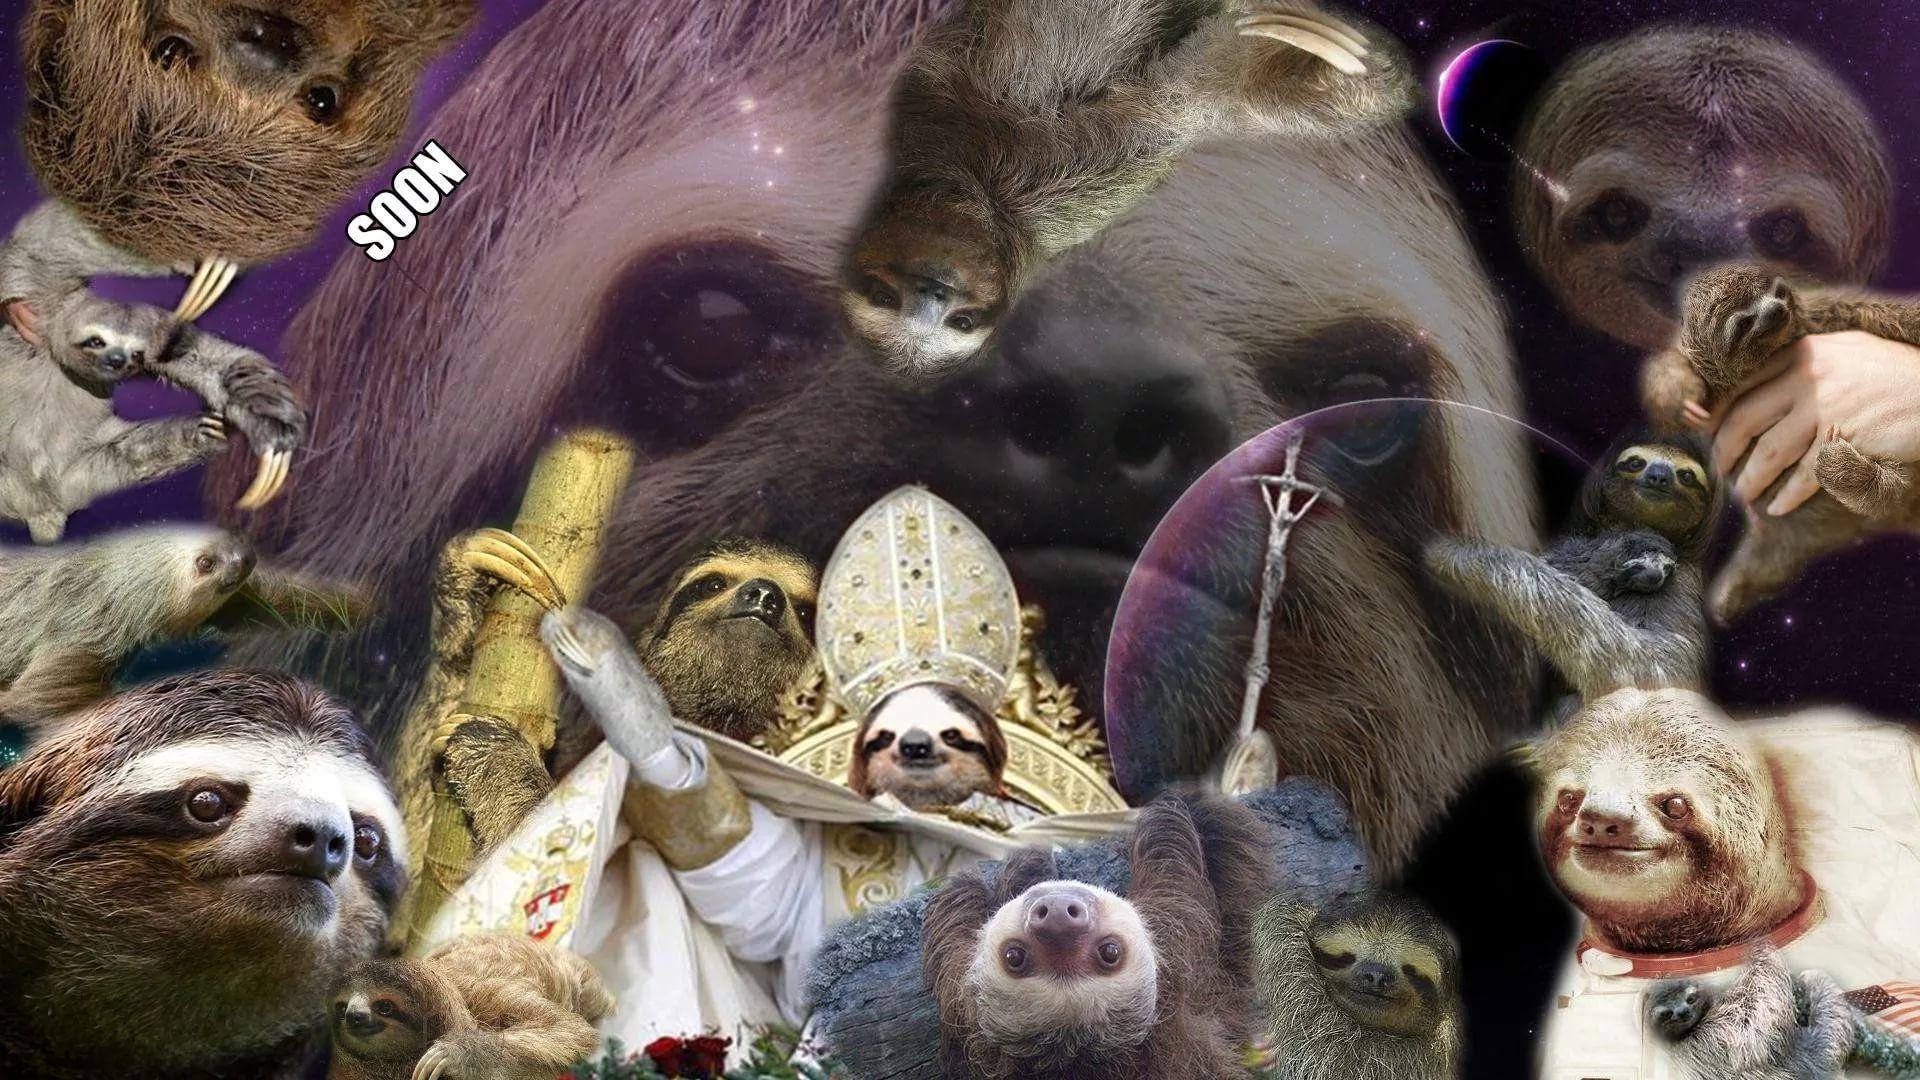 Sloth hd wallpaper 1080